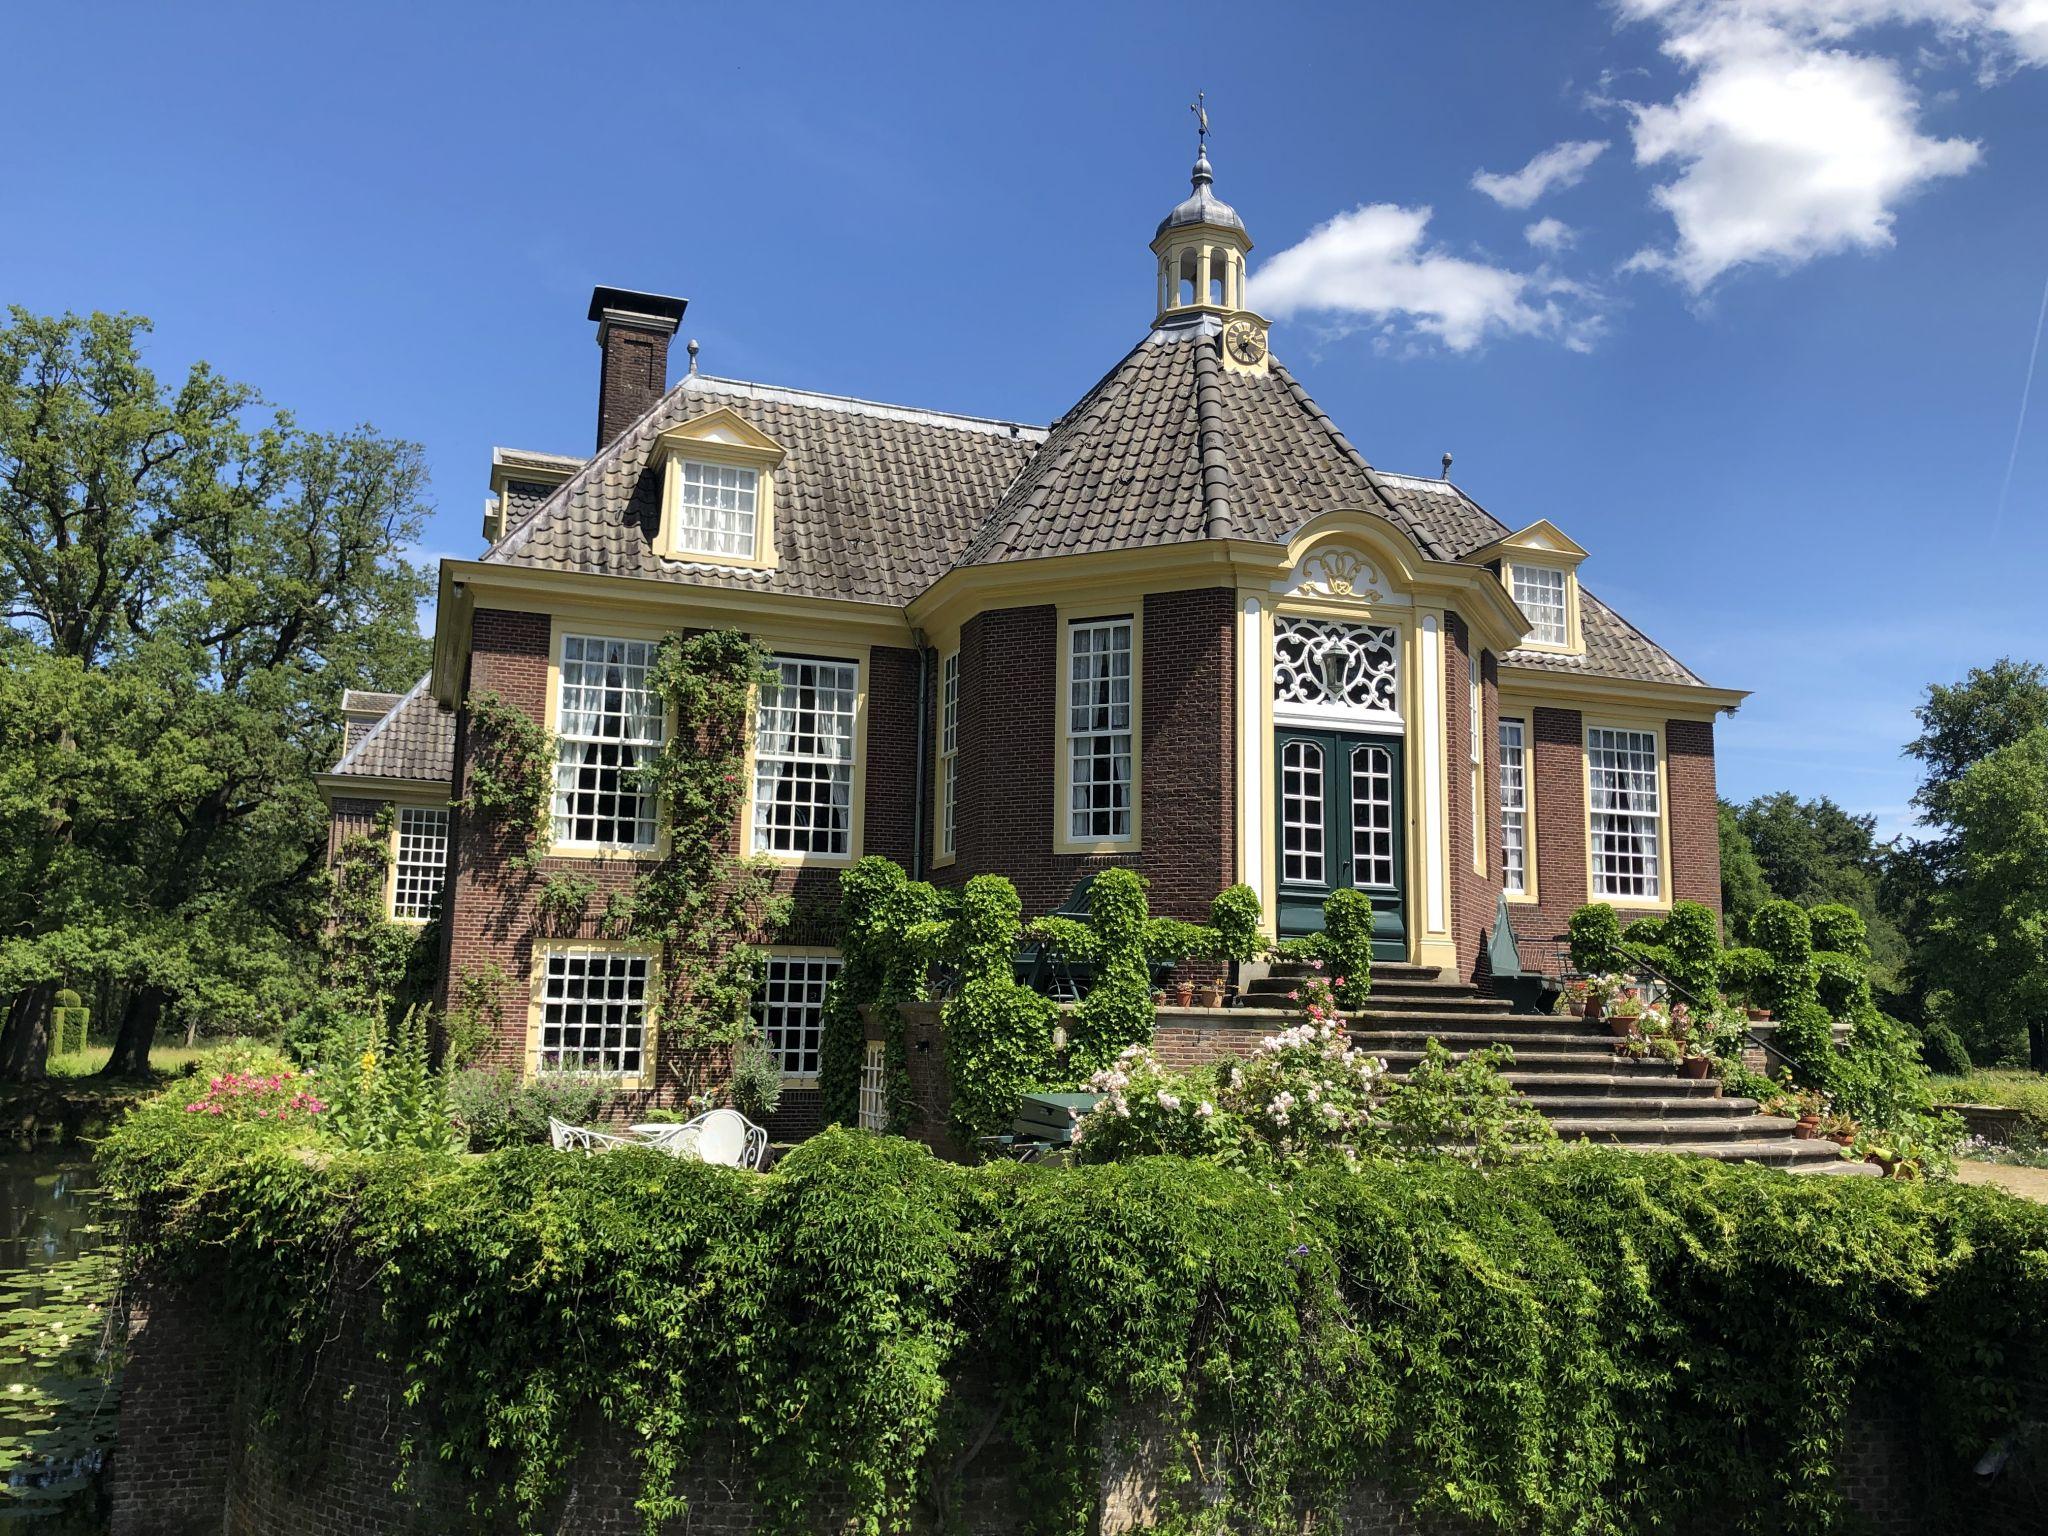 De Wiersse, Netherlands